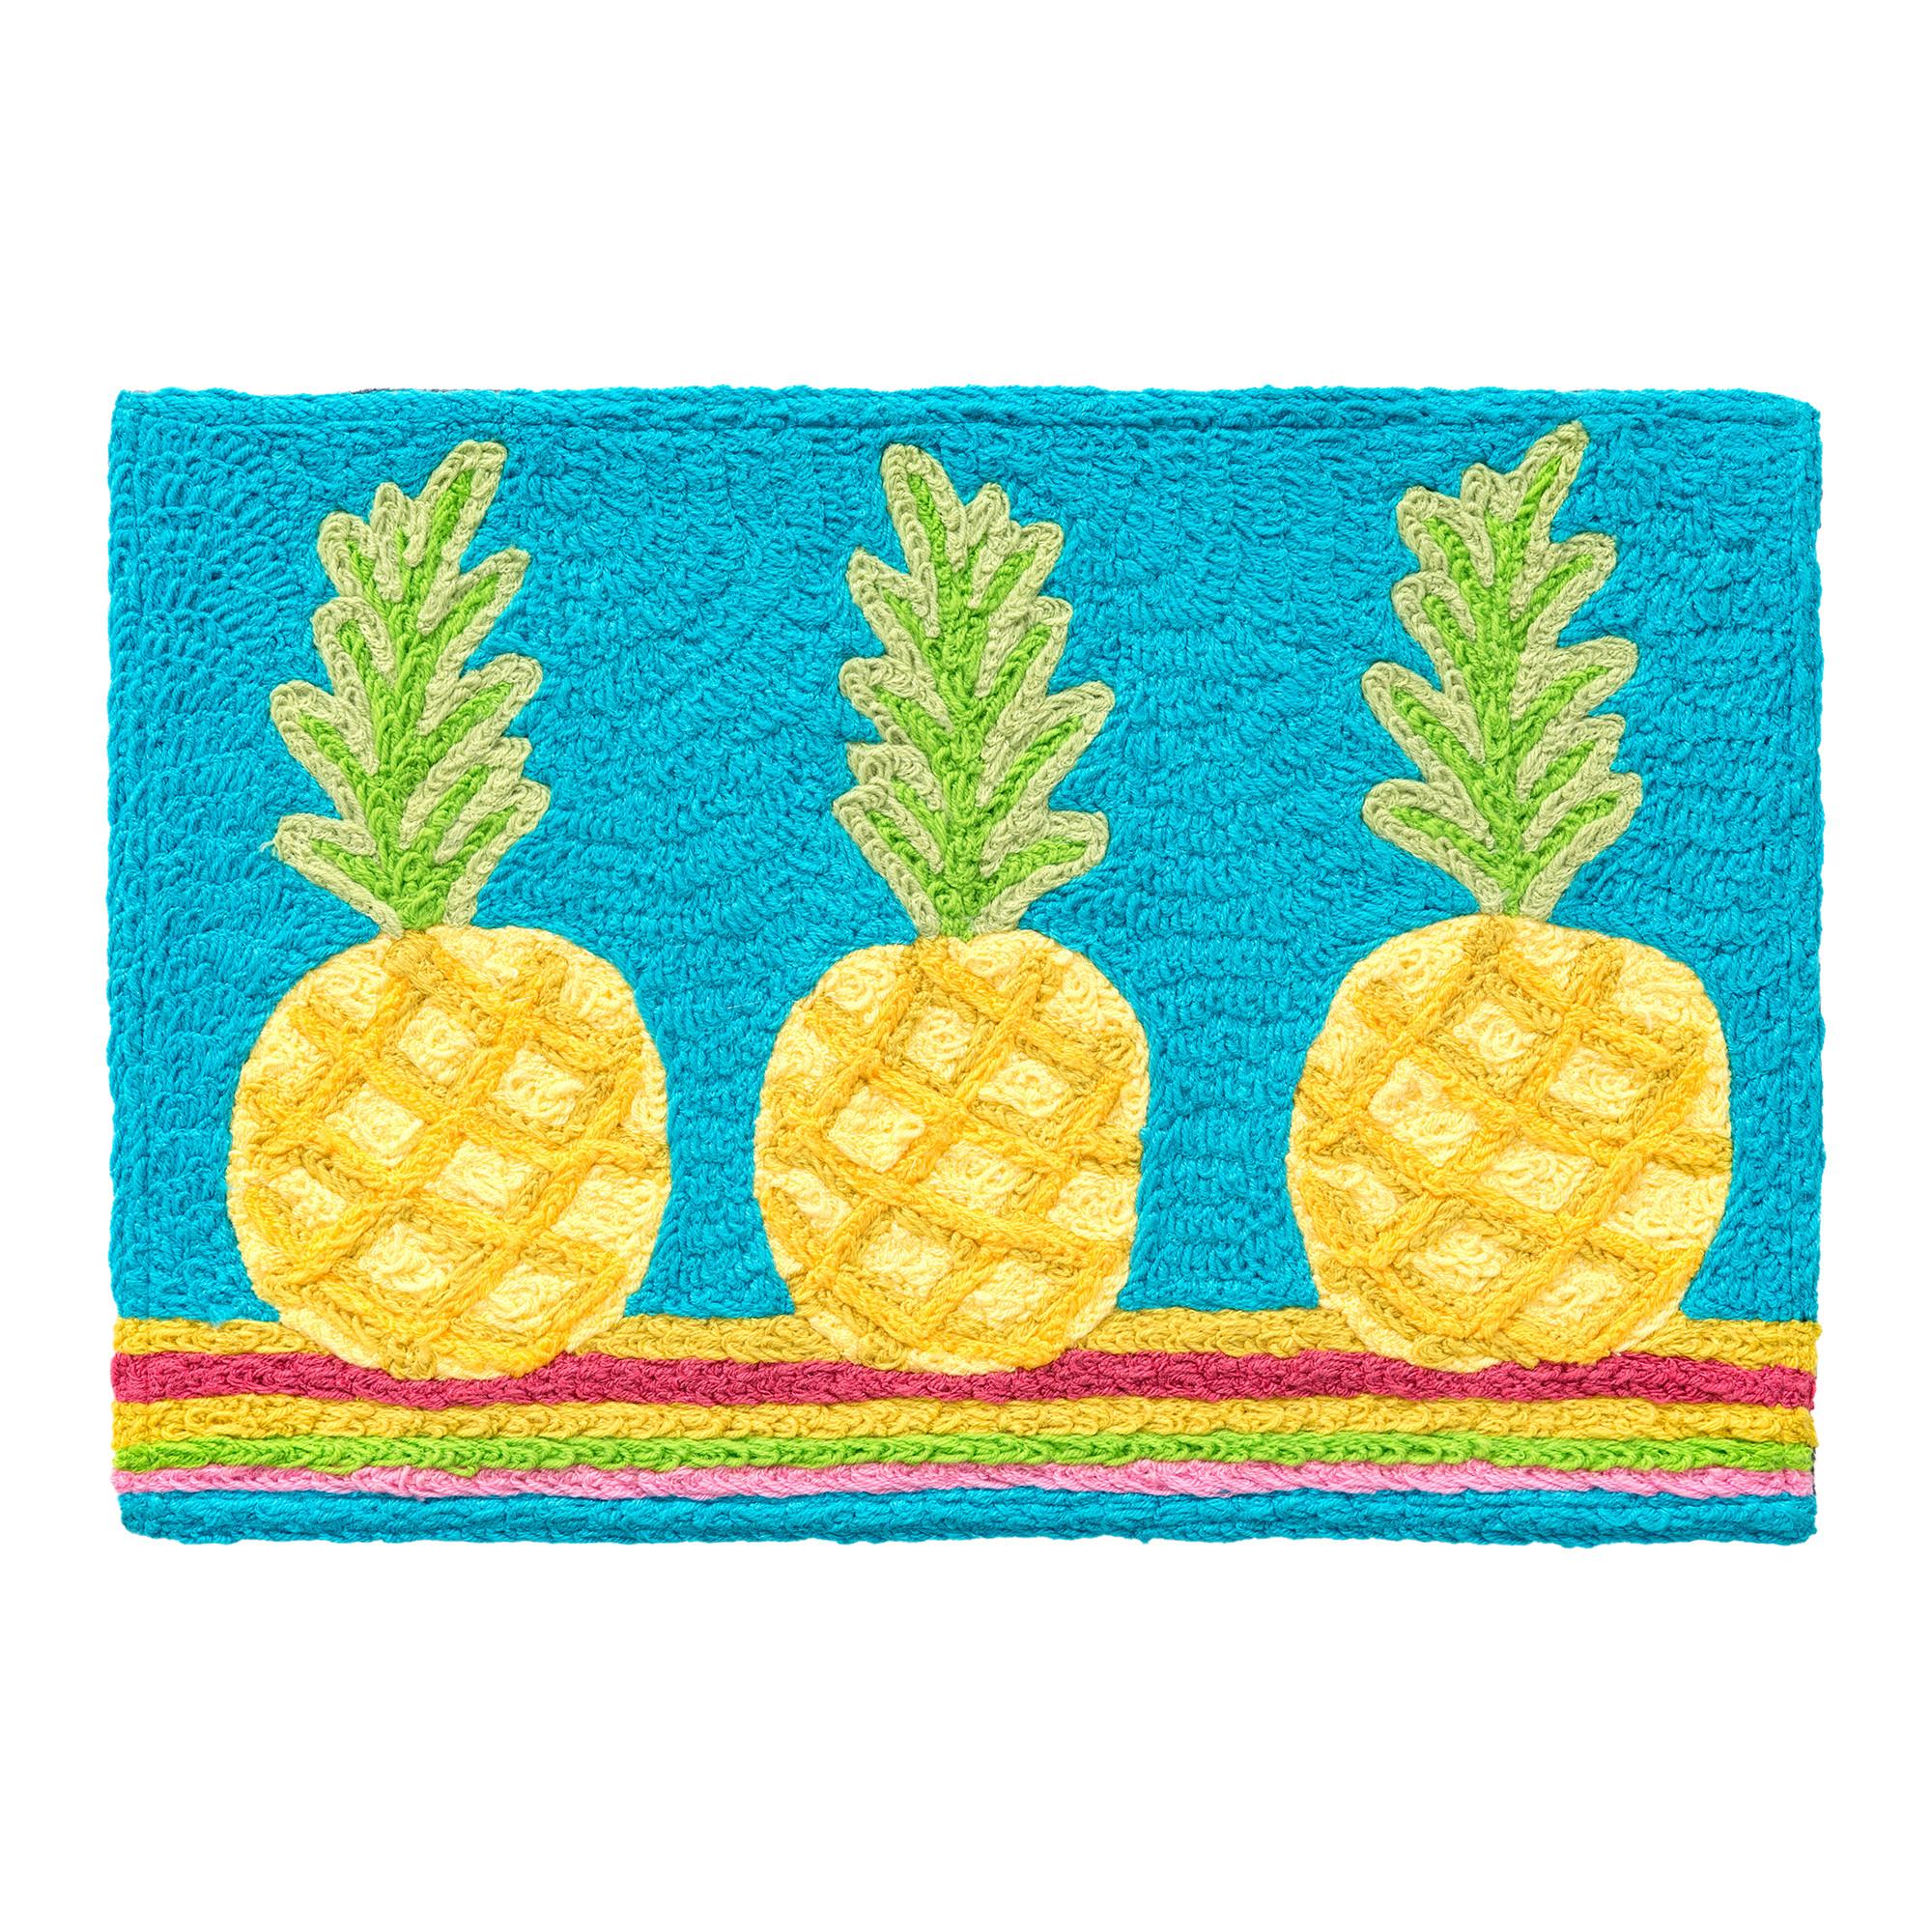 Pineapple Fiesta